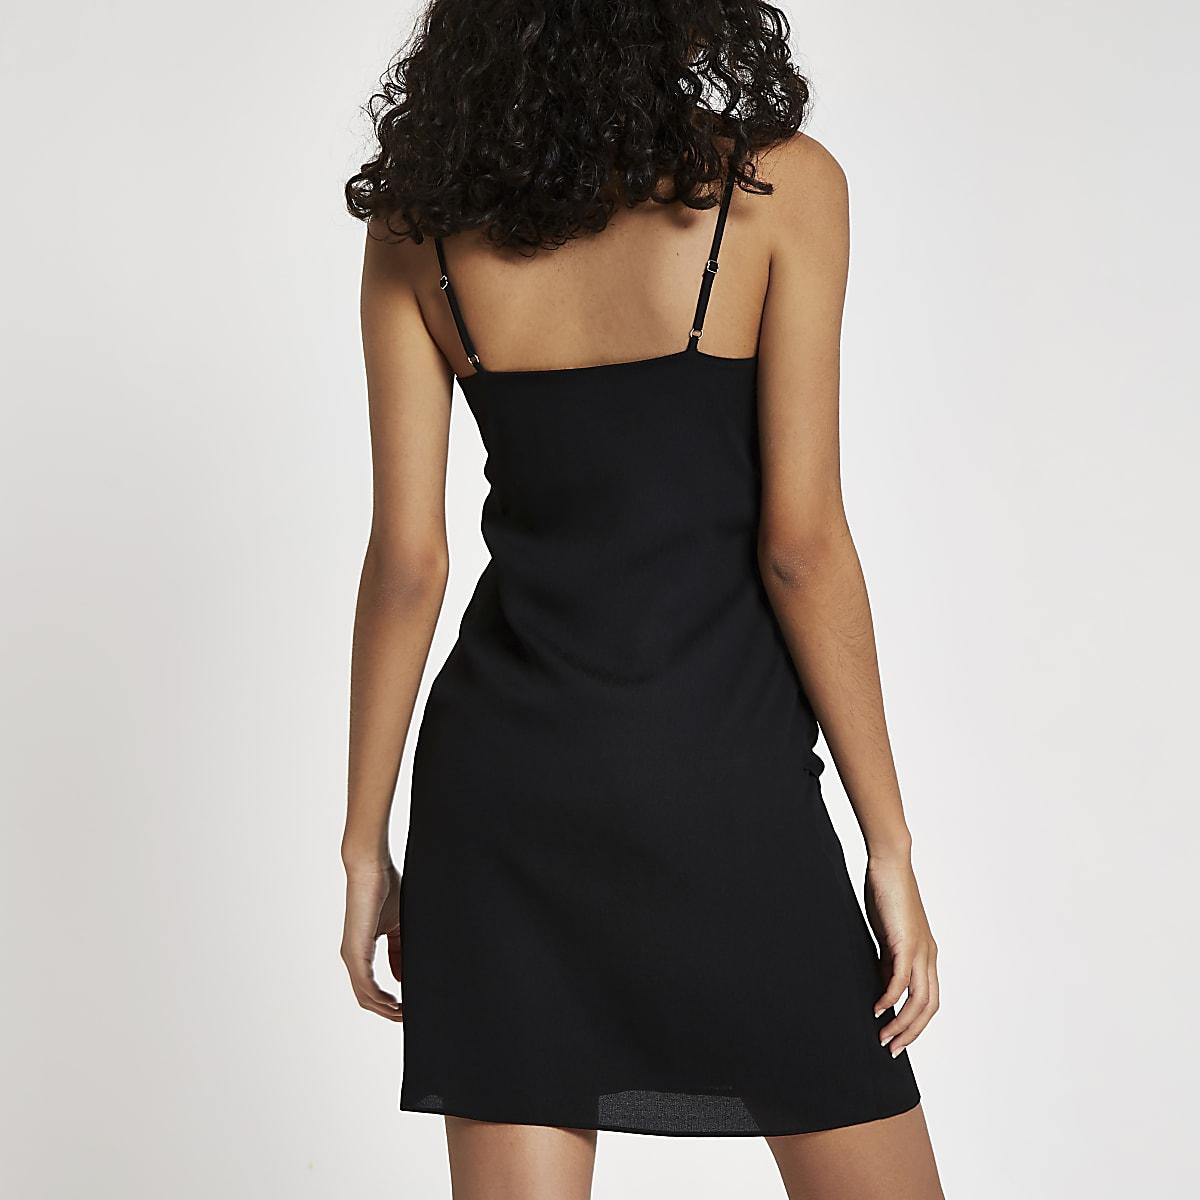 a686c7d6ae Black tie front cami slip dress - Slip   Cami Dresses - Dresses - women